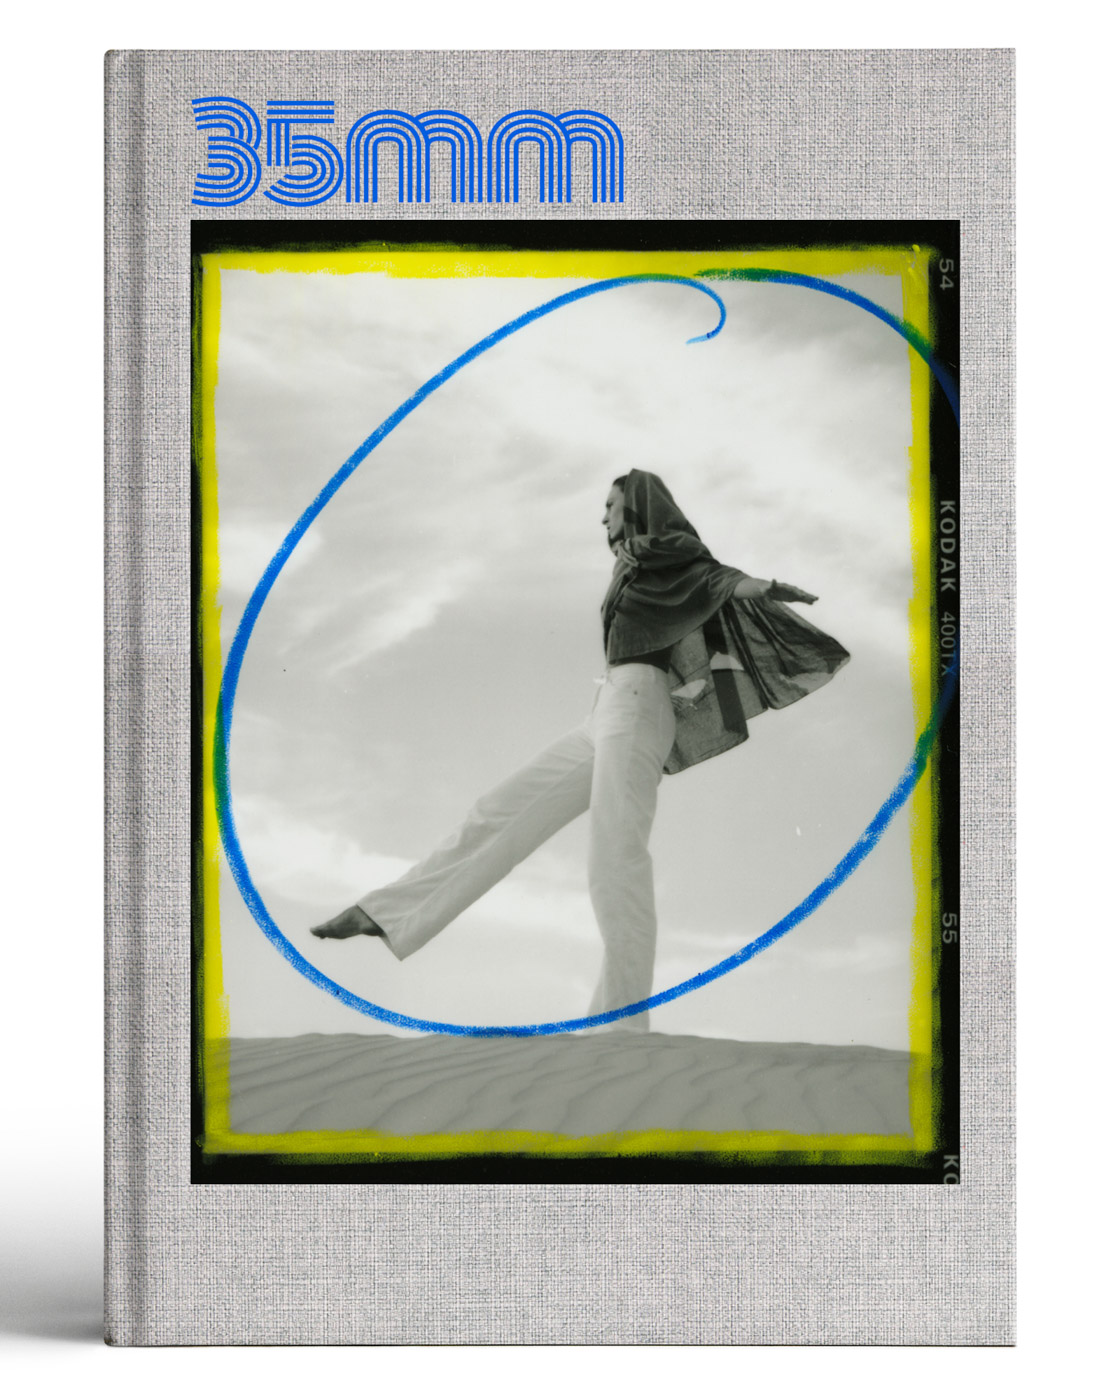 35mm_magazine_book_issue_film_only23.jpg